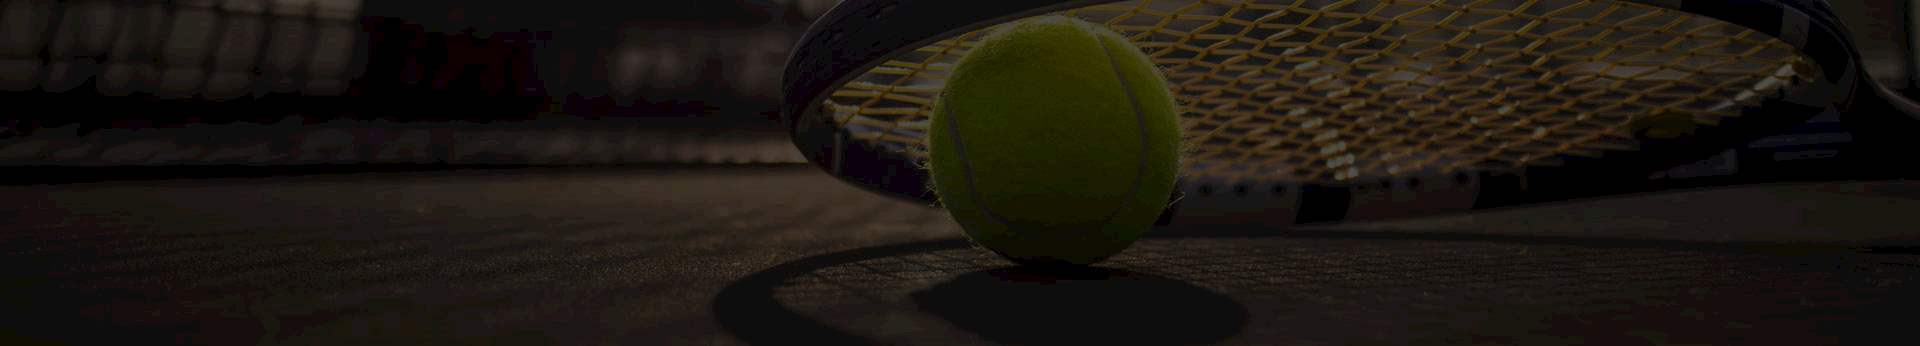 Newport, Rhode Island Tennis Hall of Fame